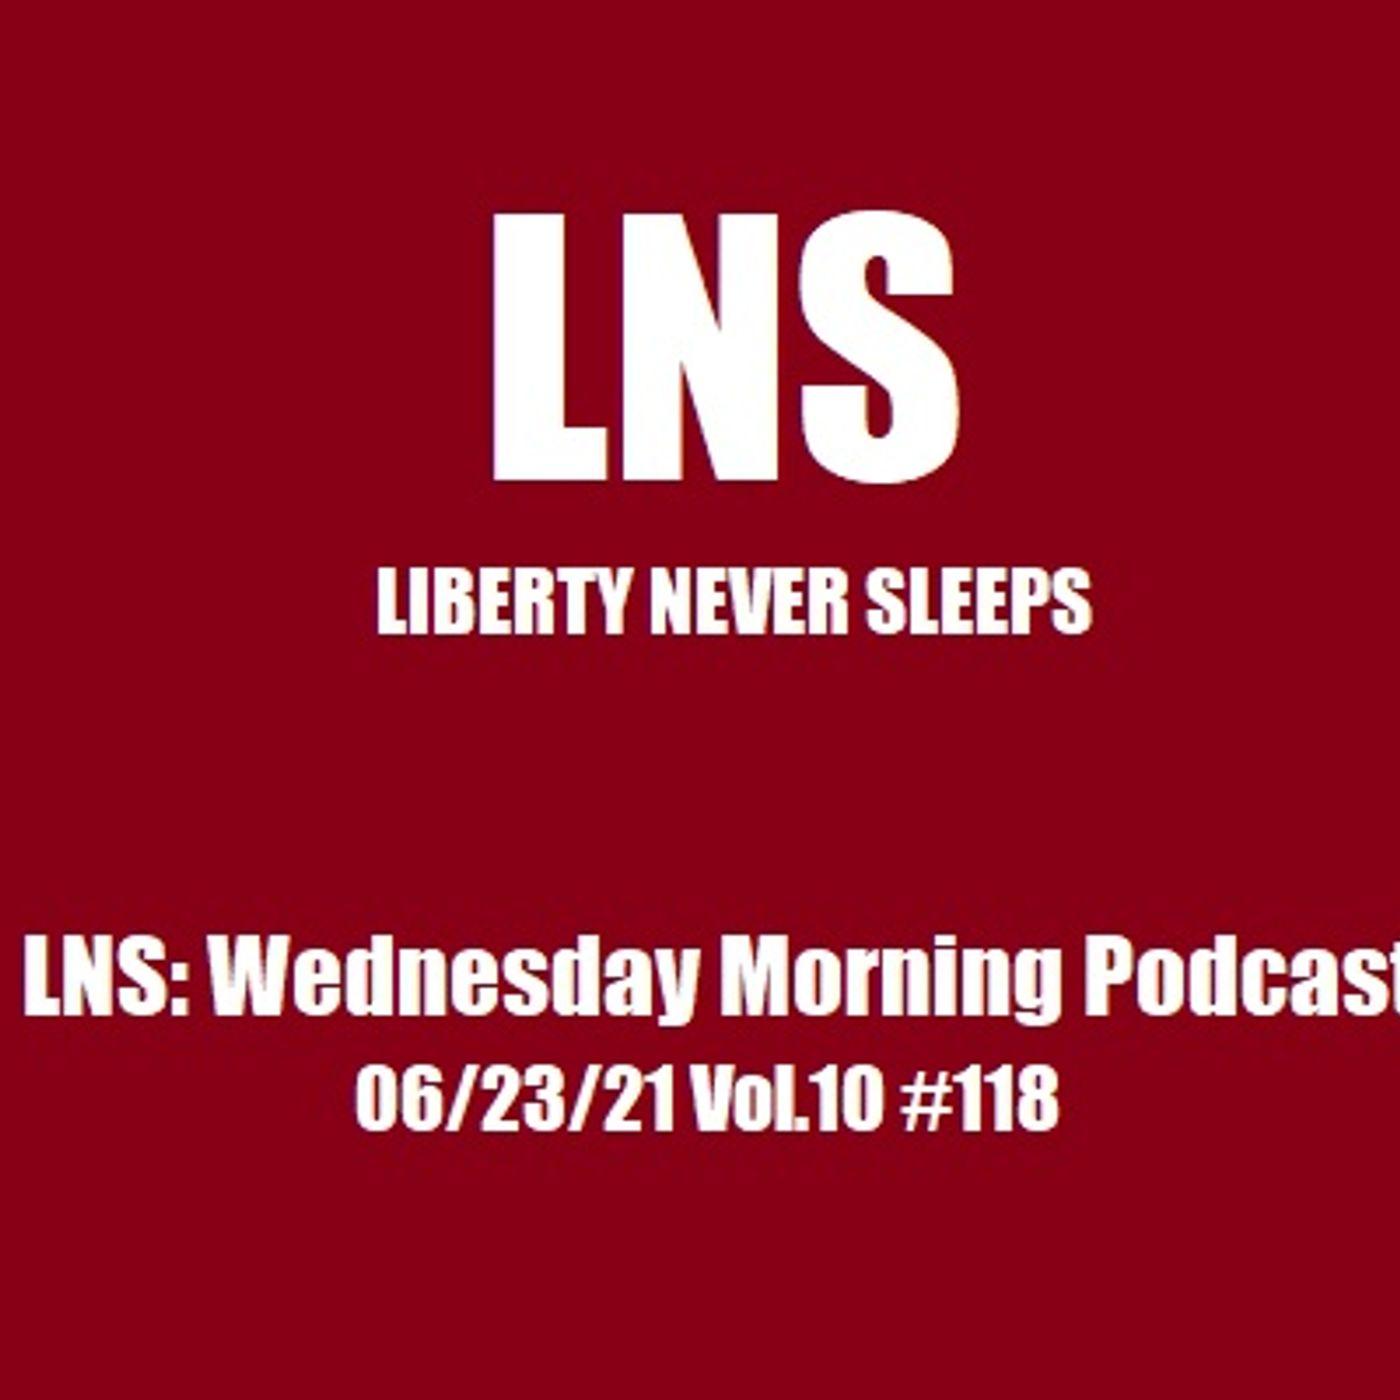 LNS: Wednesday Morning Podcast 06/23/21 Vol.10 #118